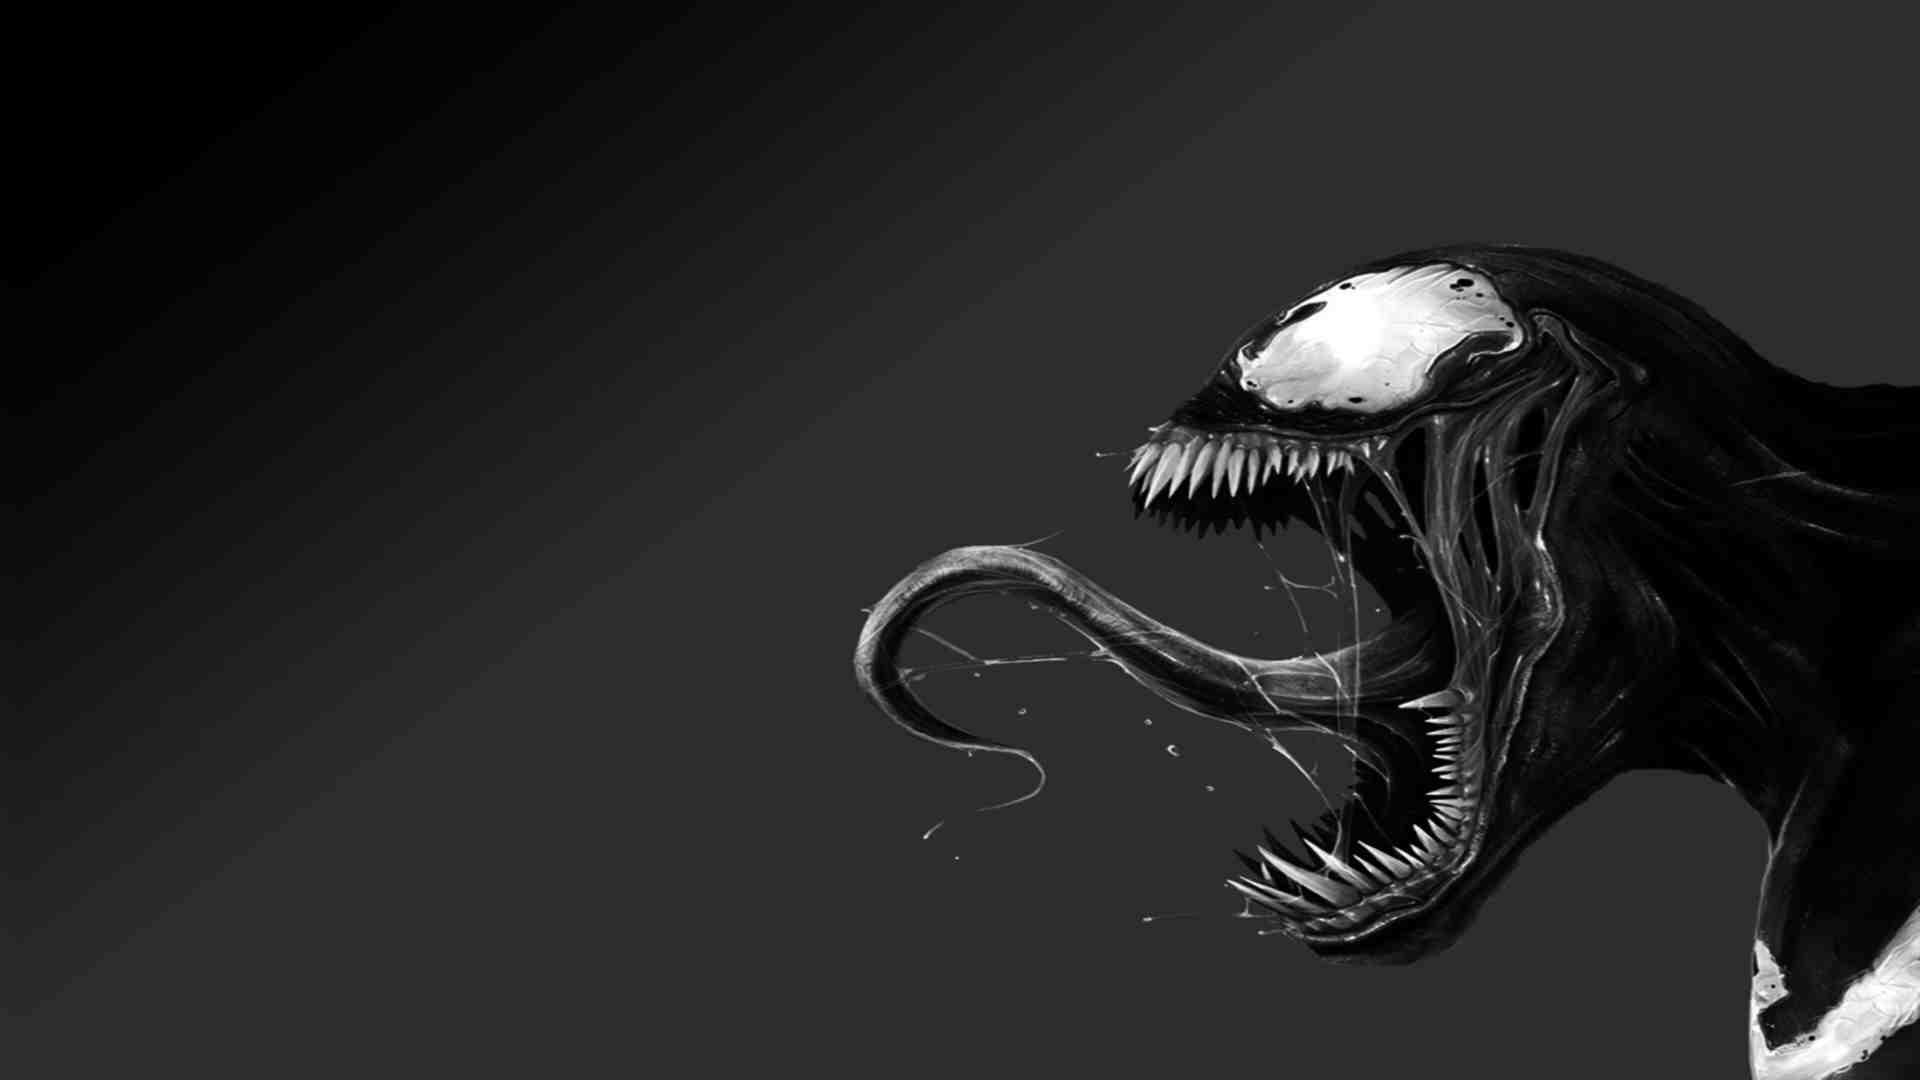 Marvel Venom Wallpapers Top Free Marvel Venom Backgrounds